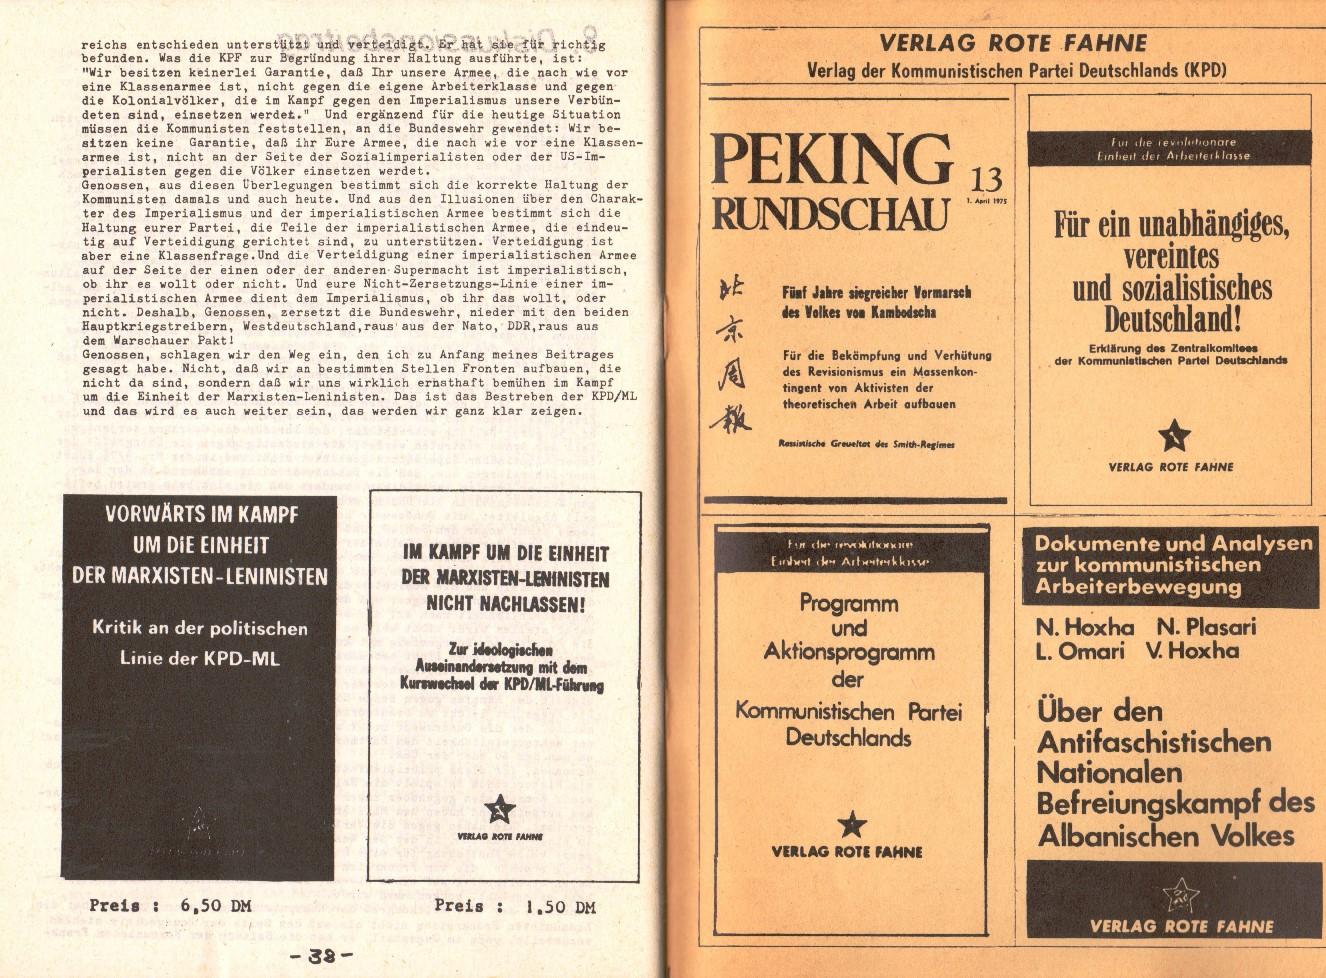 Berlin_AO_1976_Veranstaltung_mit_KPDML_20